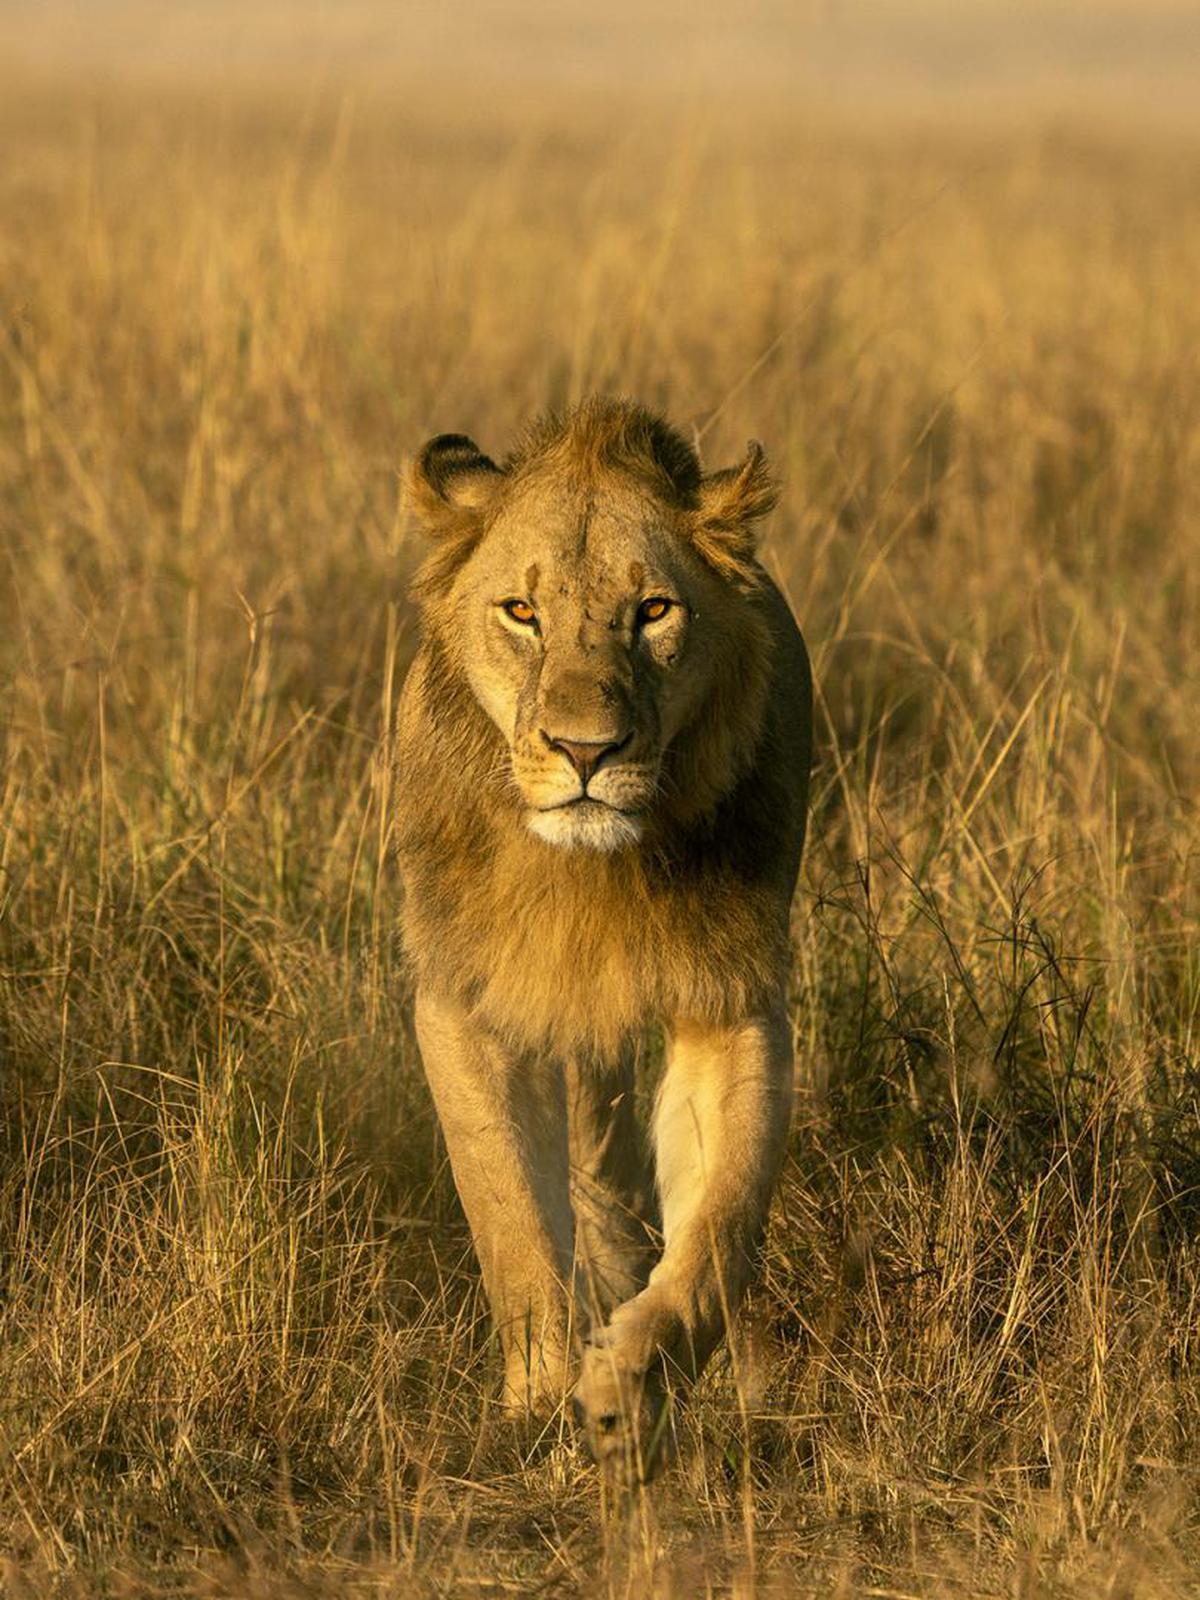 Image of Wildlife, Lion, Mammal, Terrestrial animal, Hair, Masai lion etc.